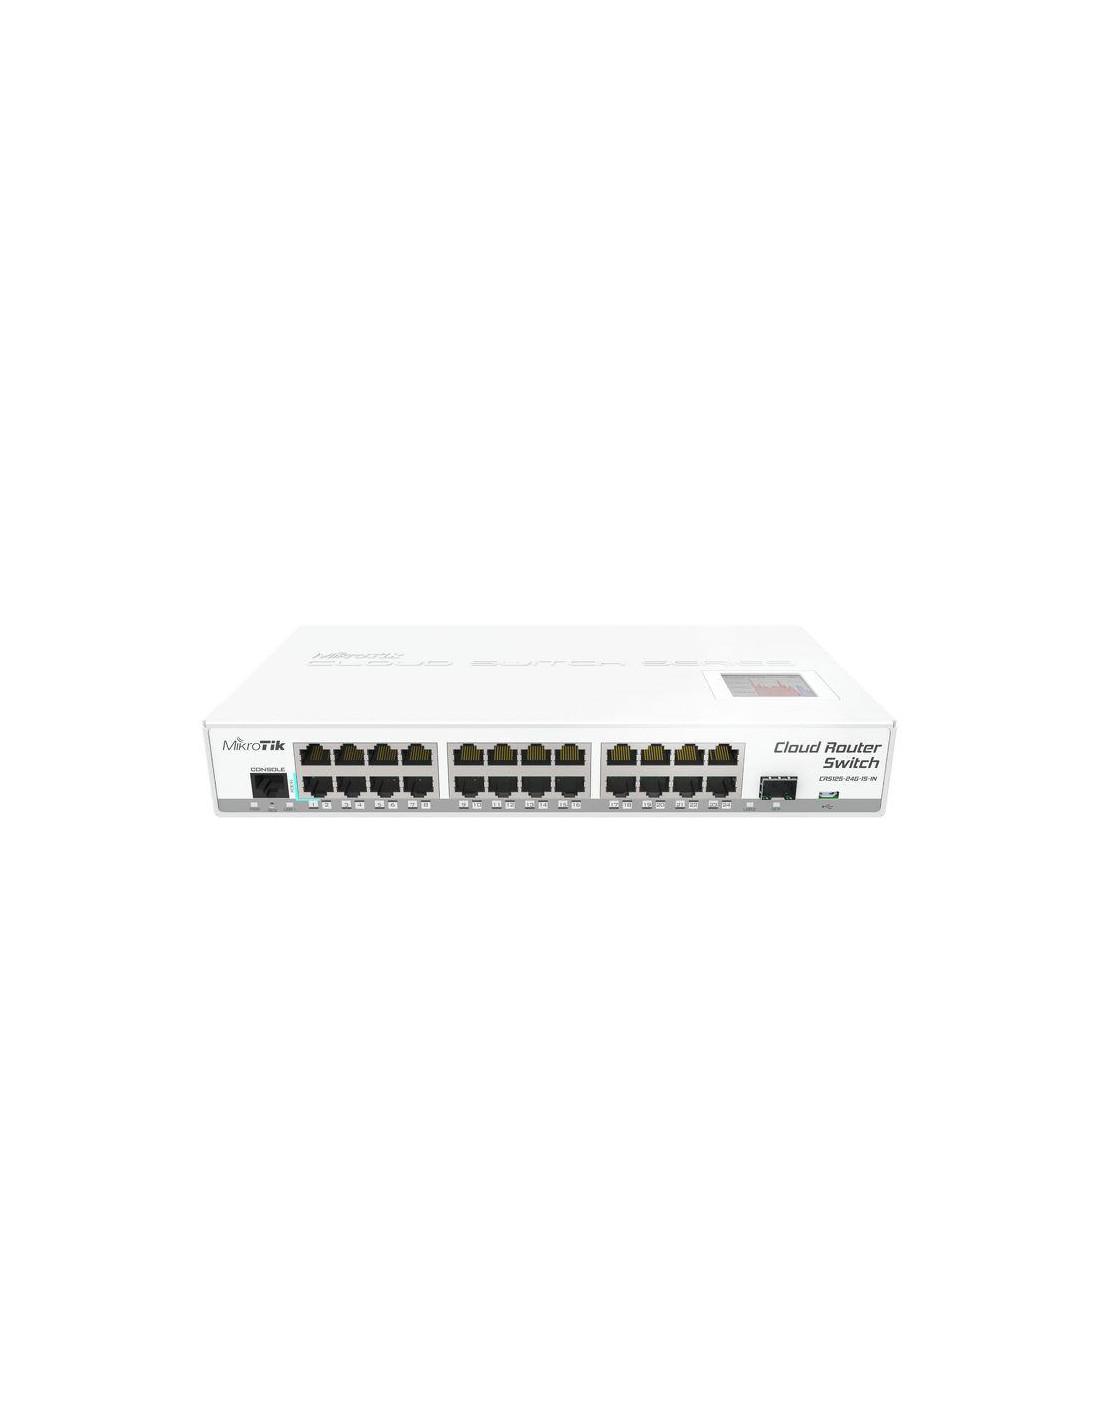 https://www.wisp.net.au/1394-thickbox_default/mini-pci-express-to-usb-adapter-with-sim-uim-card-slot-for-3-4g-wwan-card.jpg